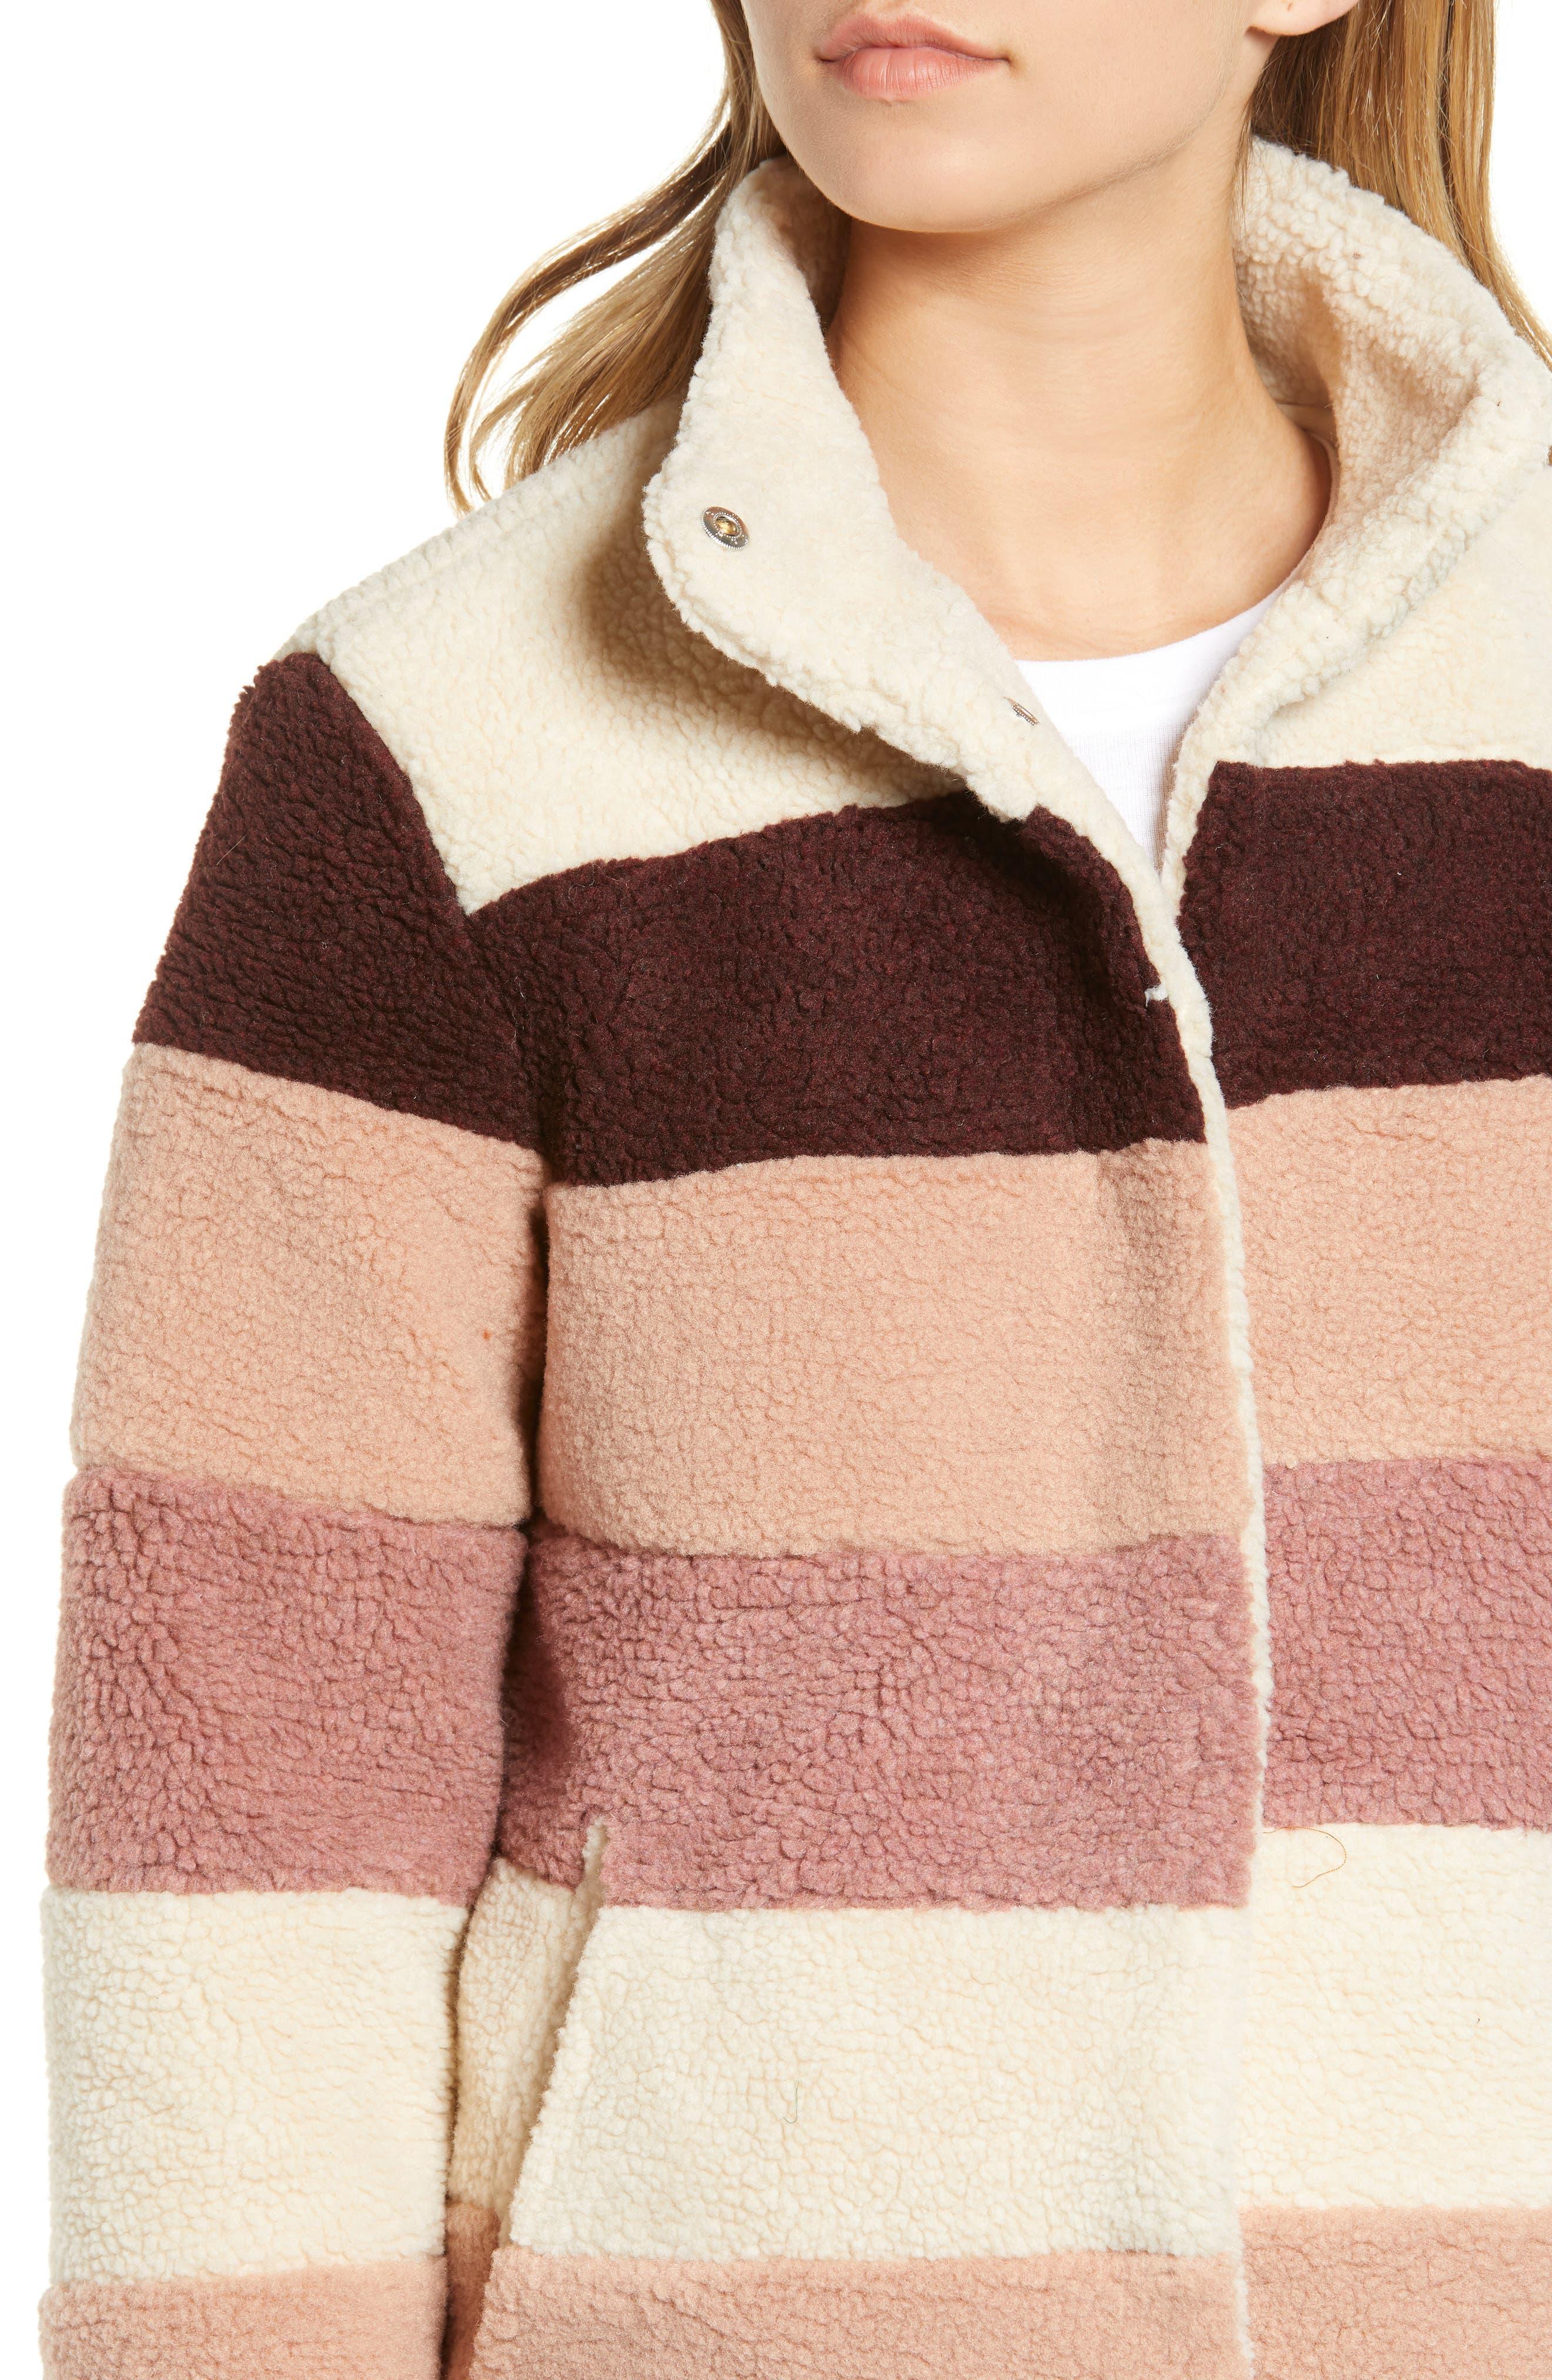 Stripe Faux Shearling Jacket,                             Alternate thumbnail 4, color,                             IVORY EGRET MUTLI STRIPE